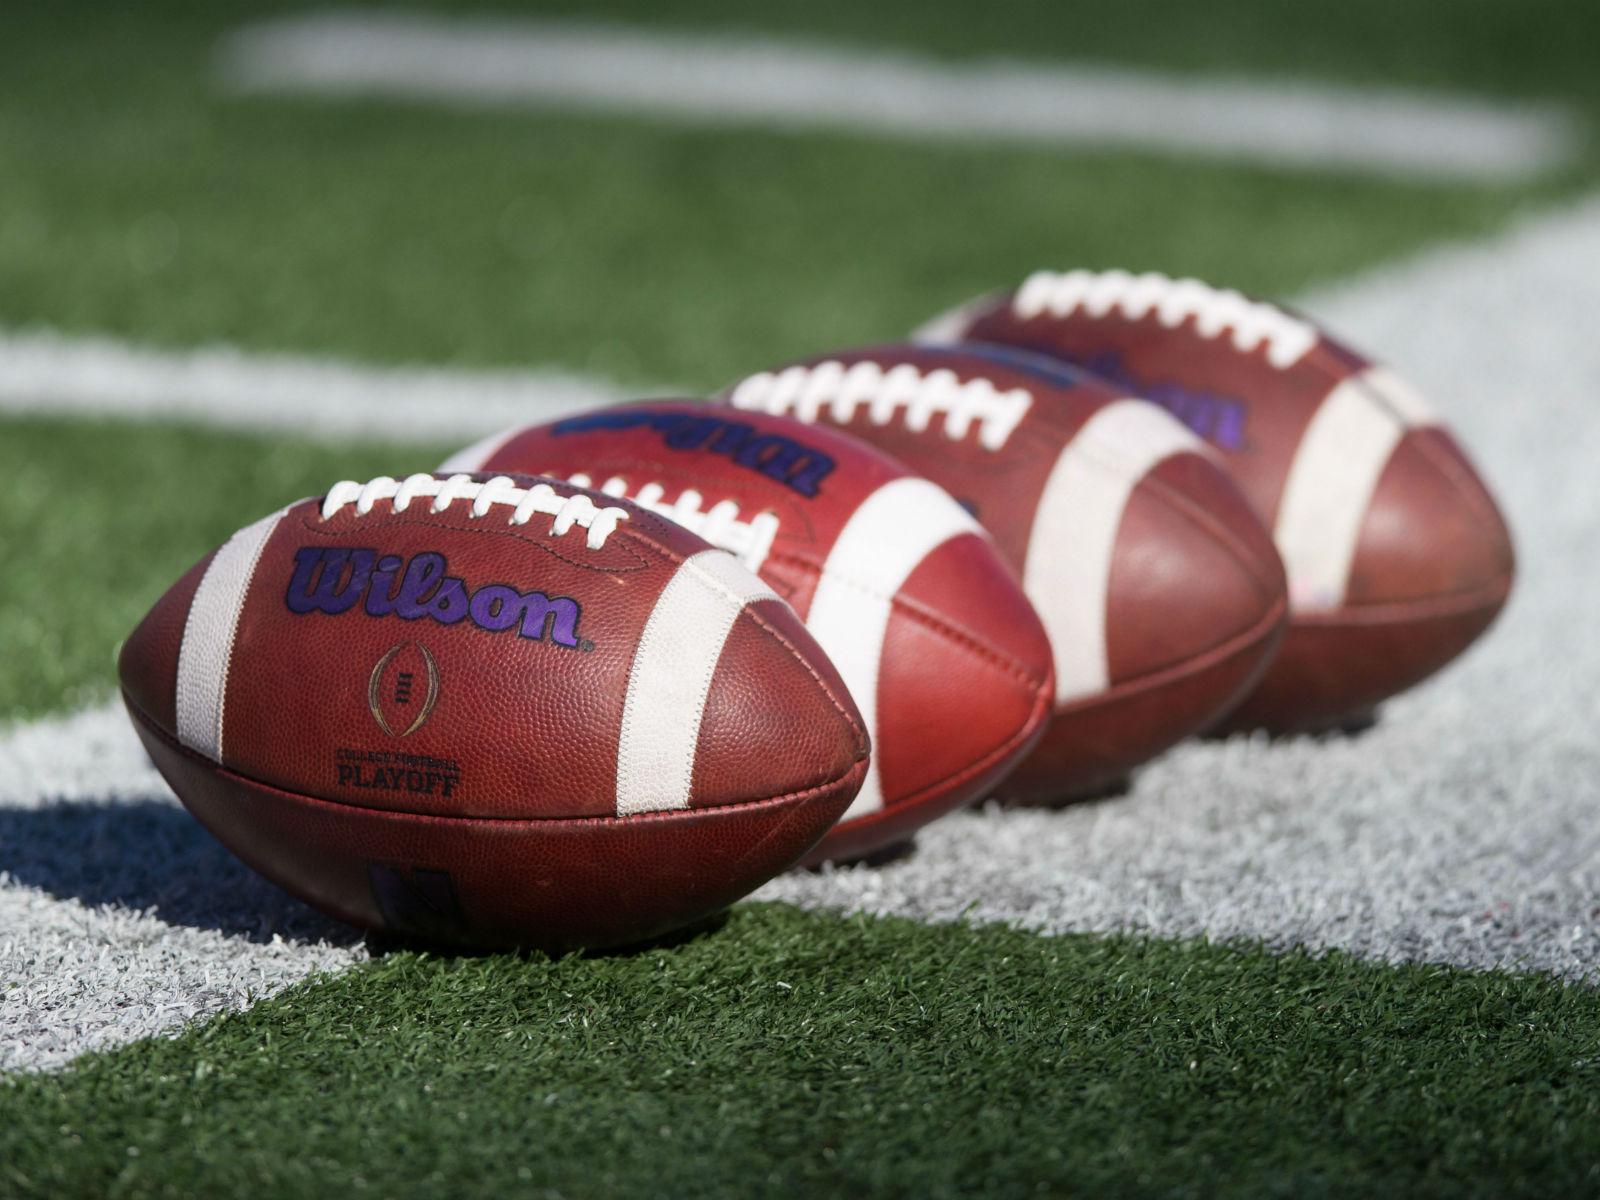 Betting college football strategies football betting 365